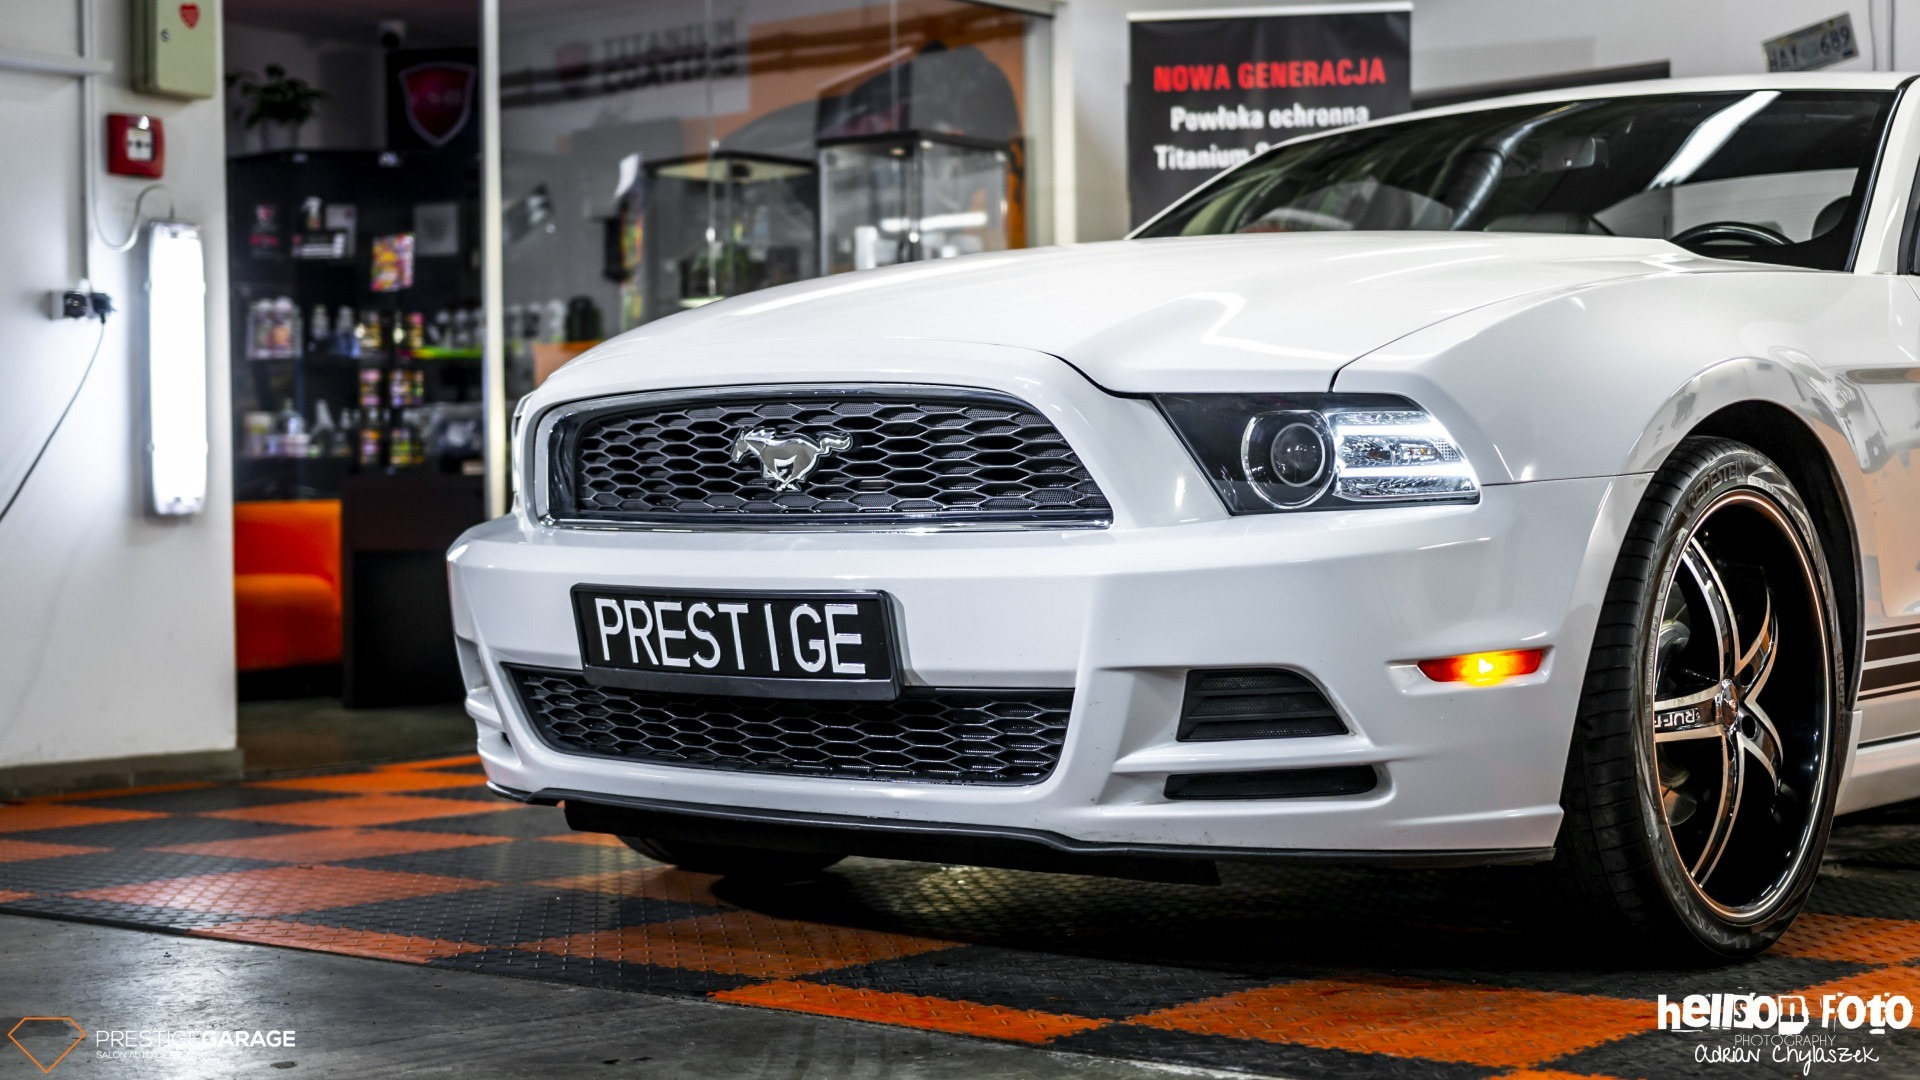 Biały Ford Mustang V-gen przód